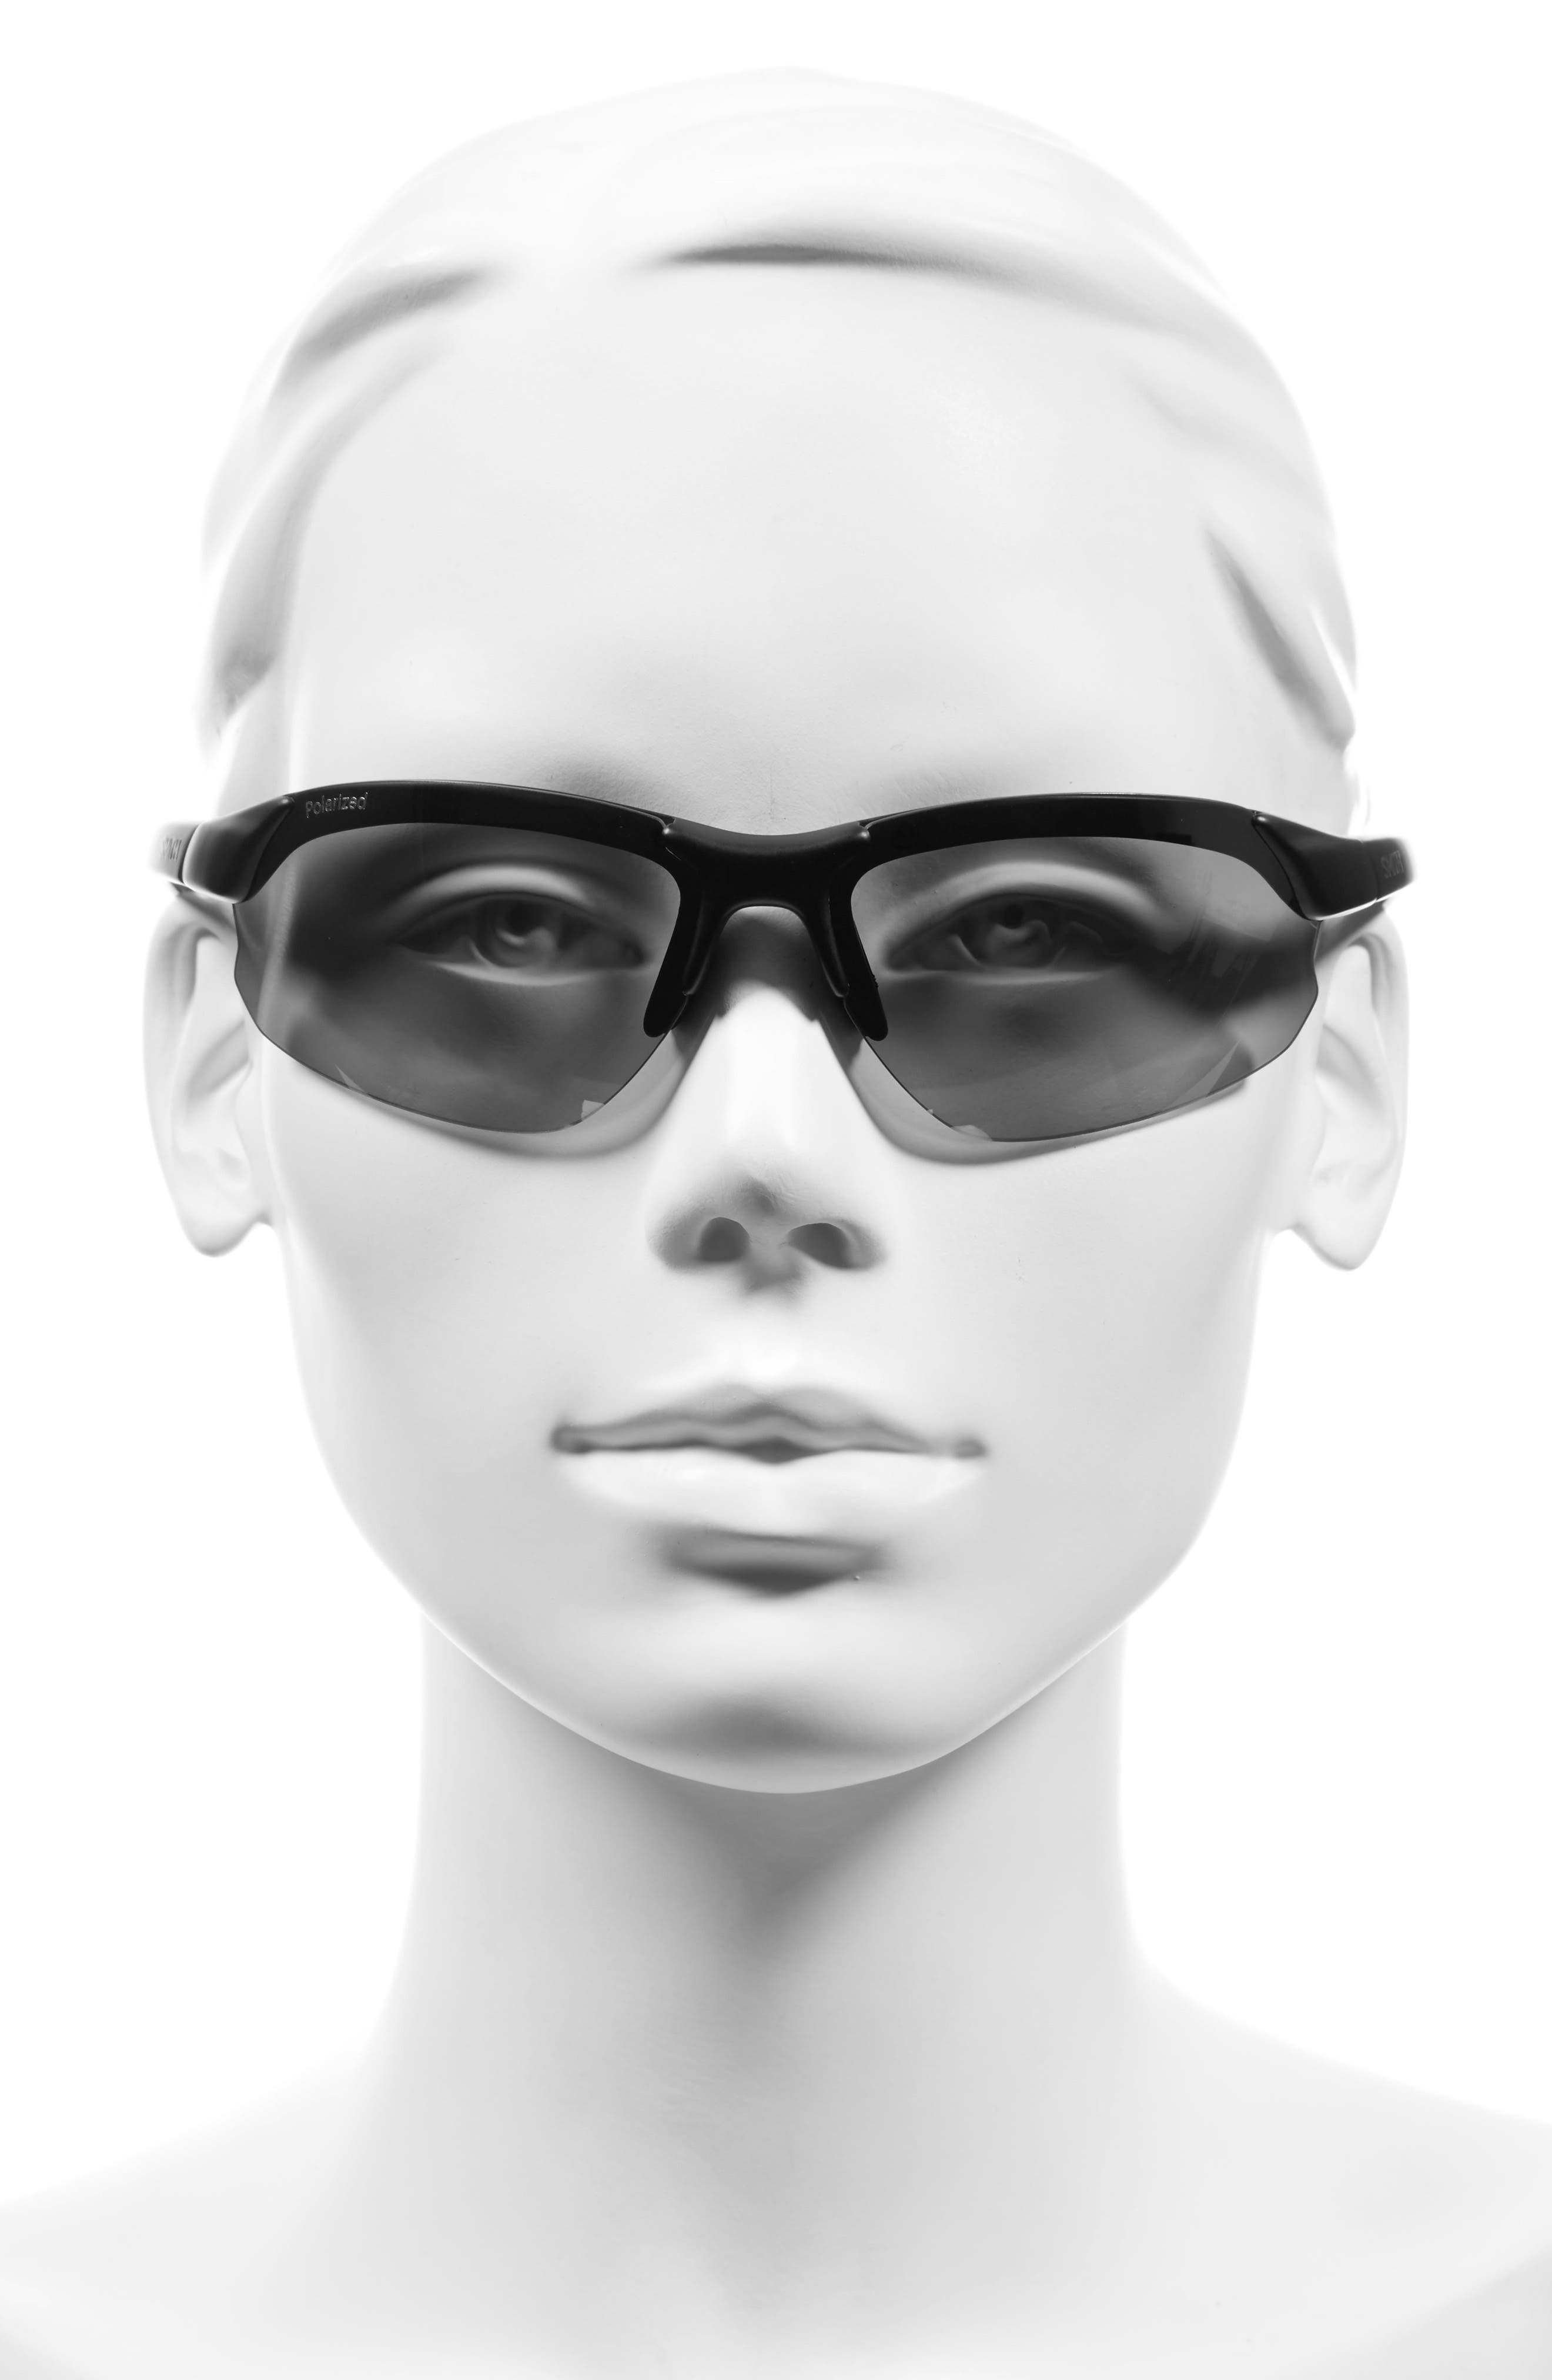 Parallel Max 69mm Polarized Sunglasses,                             Alternate thumbnail 3, color,                             001